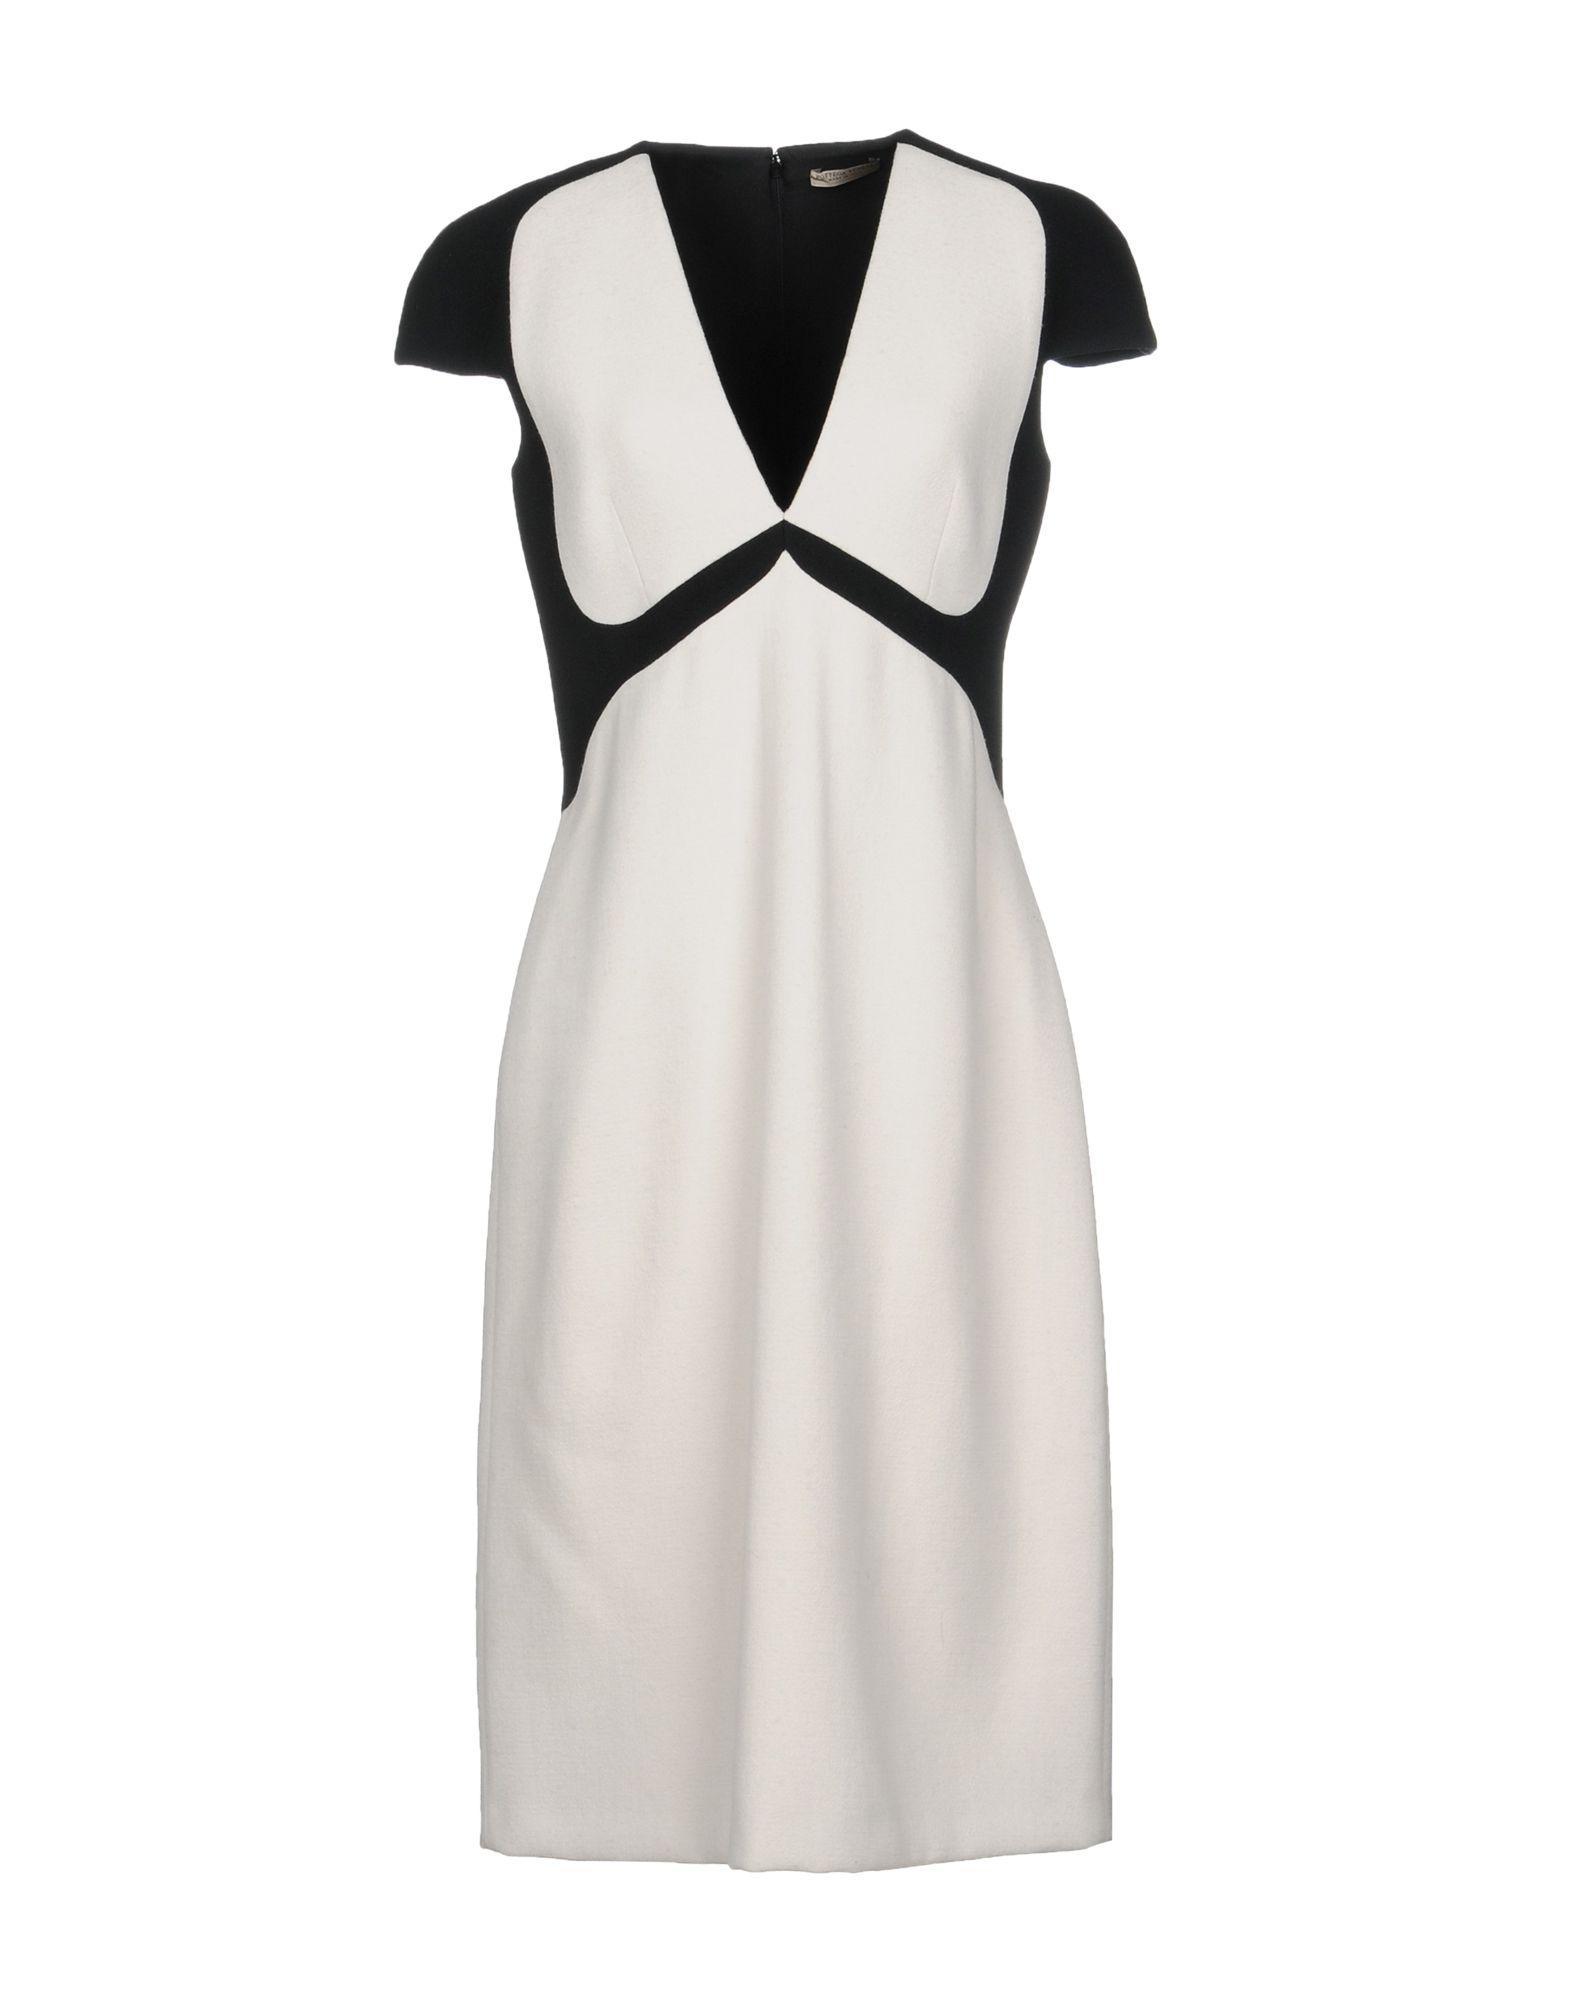 Cheap Real DRESSES - Knee-length dresses Bottega Veneta With Credit Card Online Sale Cheapest Manchester 8yVuE